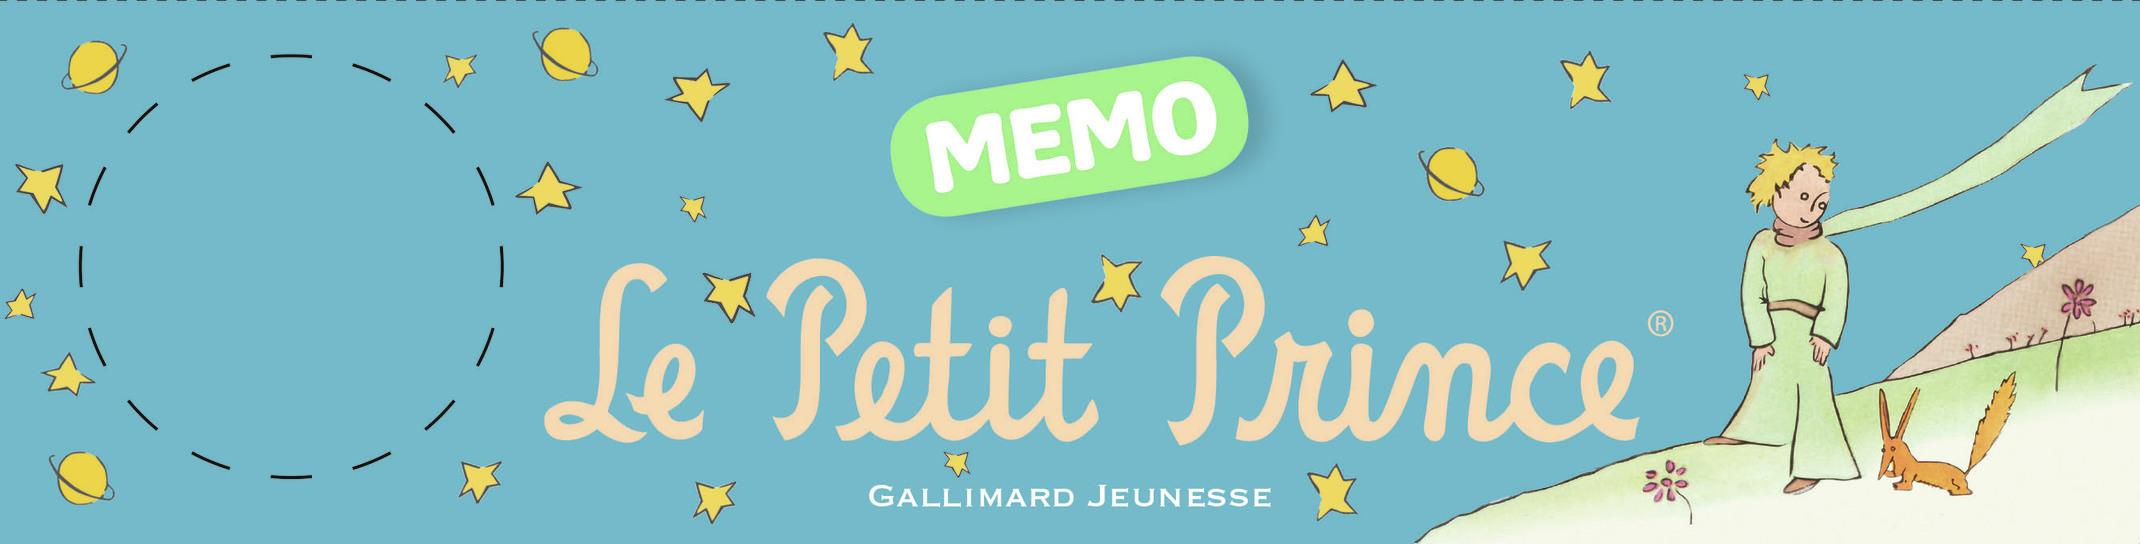 LE PETIT PRINCE - MEMO